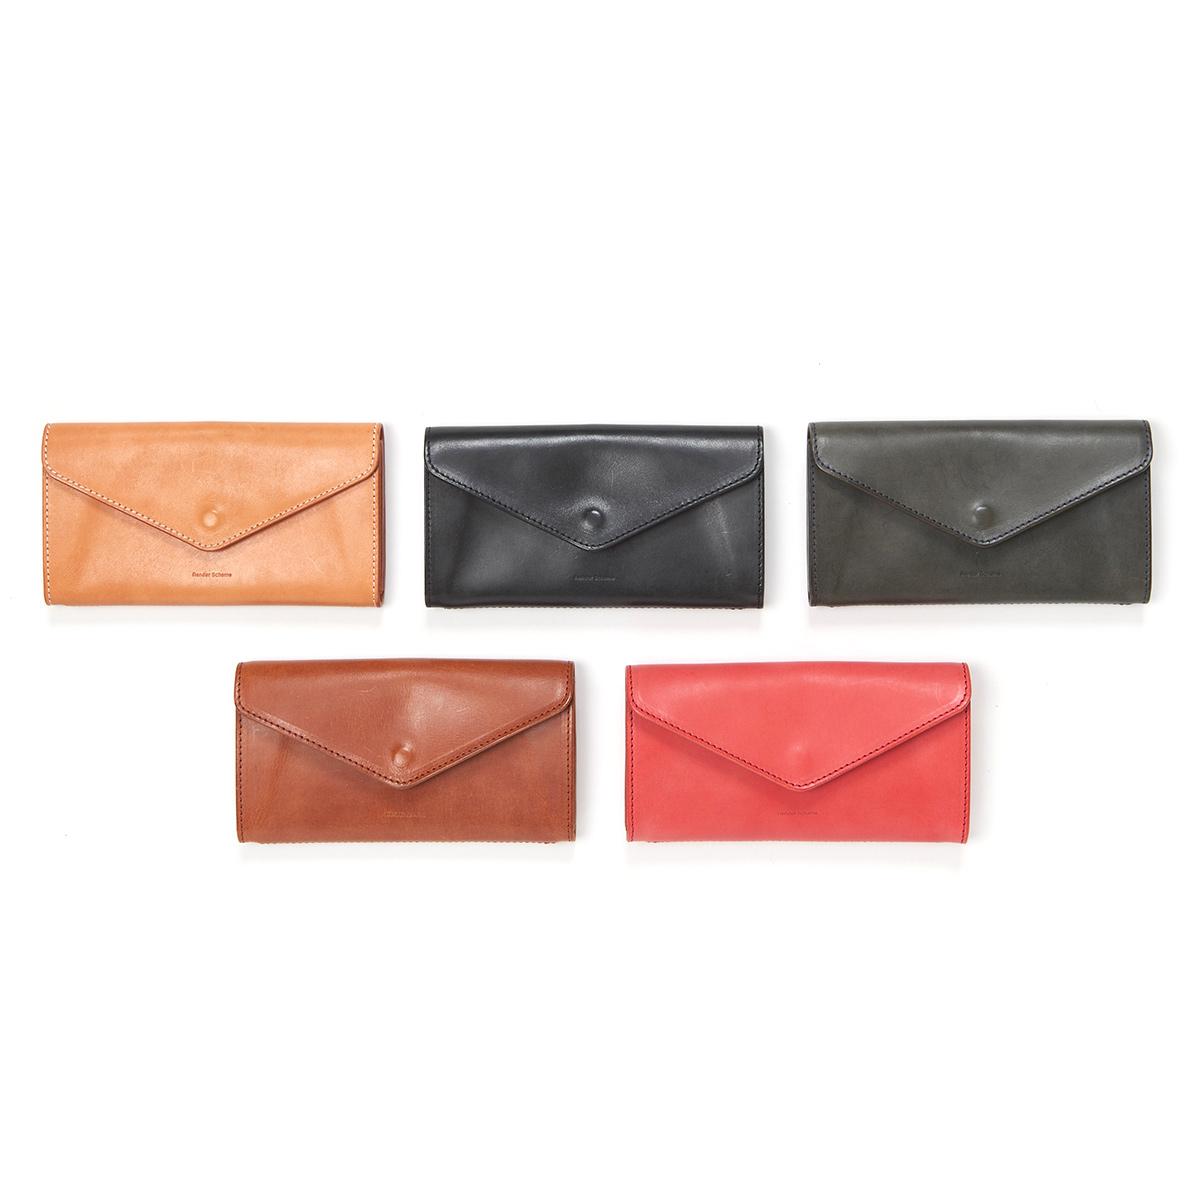 Hender Scheme / long wallet